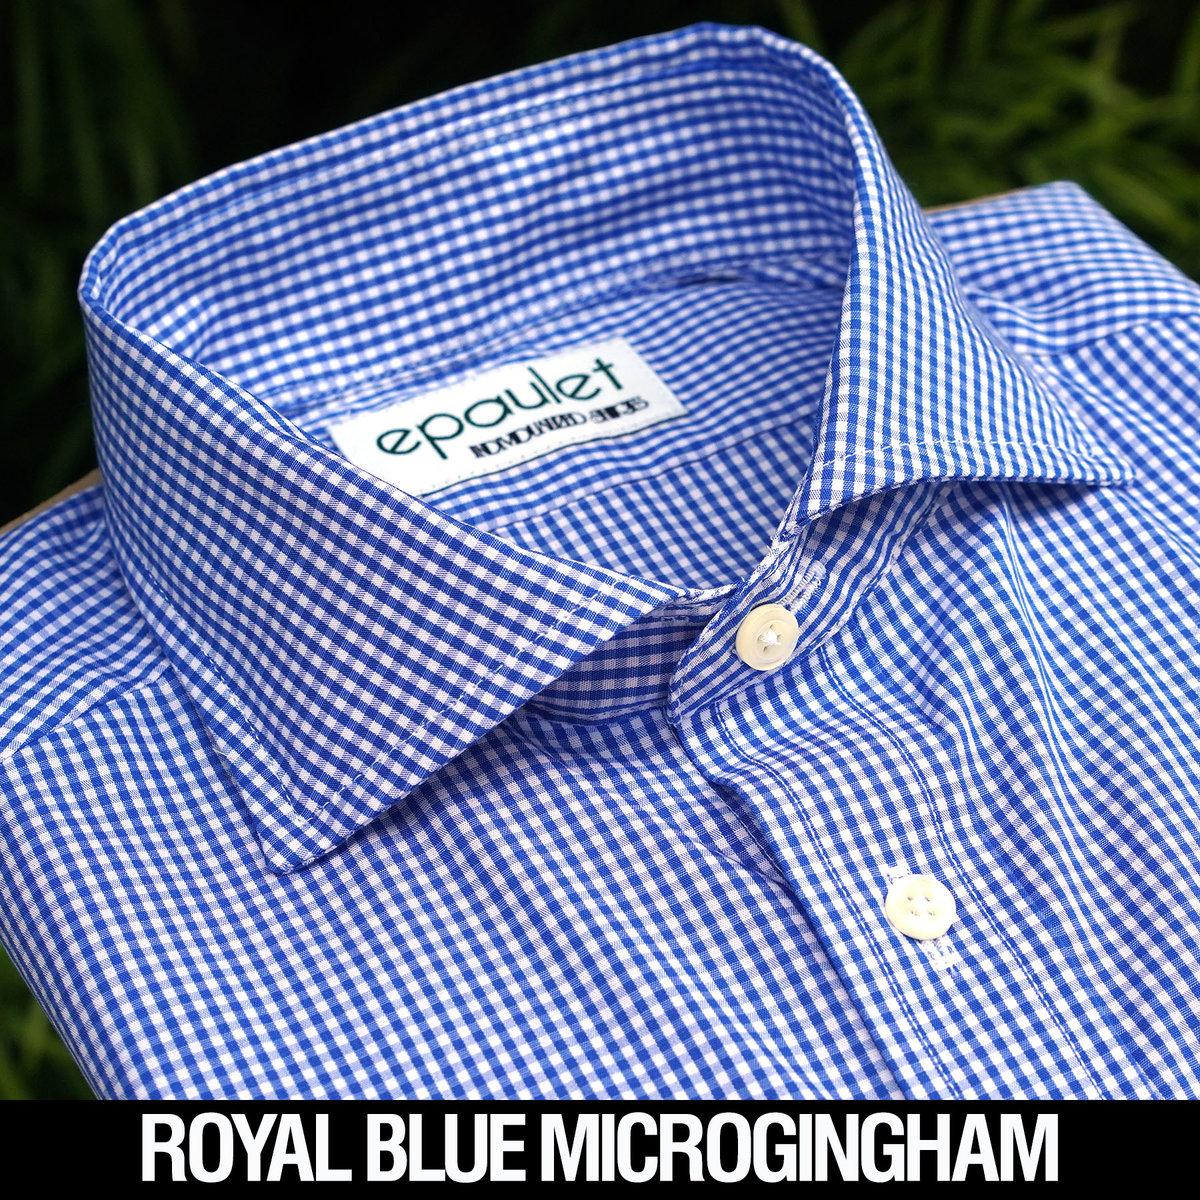 Royal Blue Microgingham.jpg